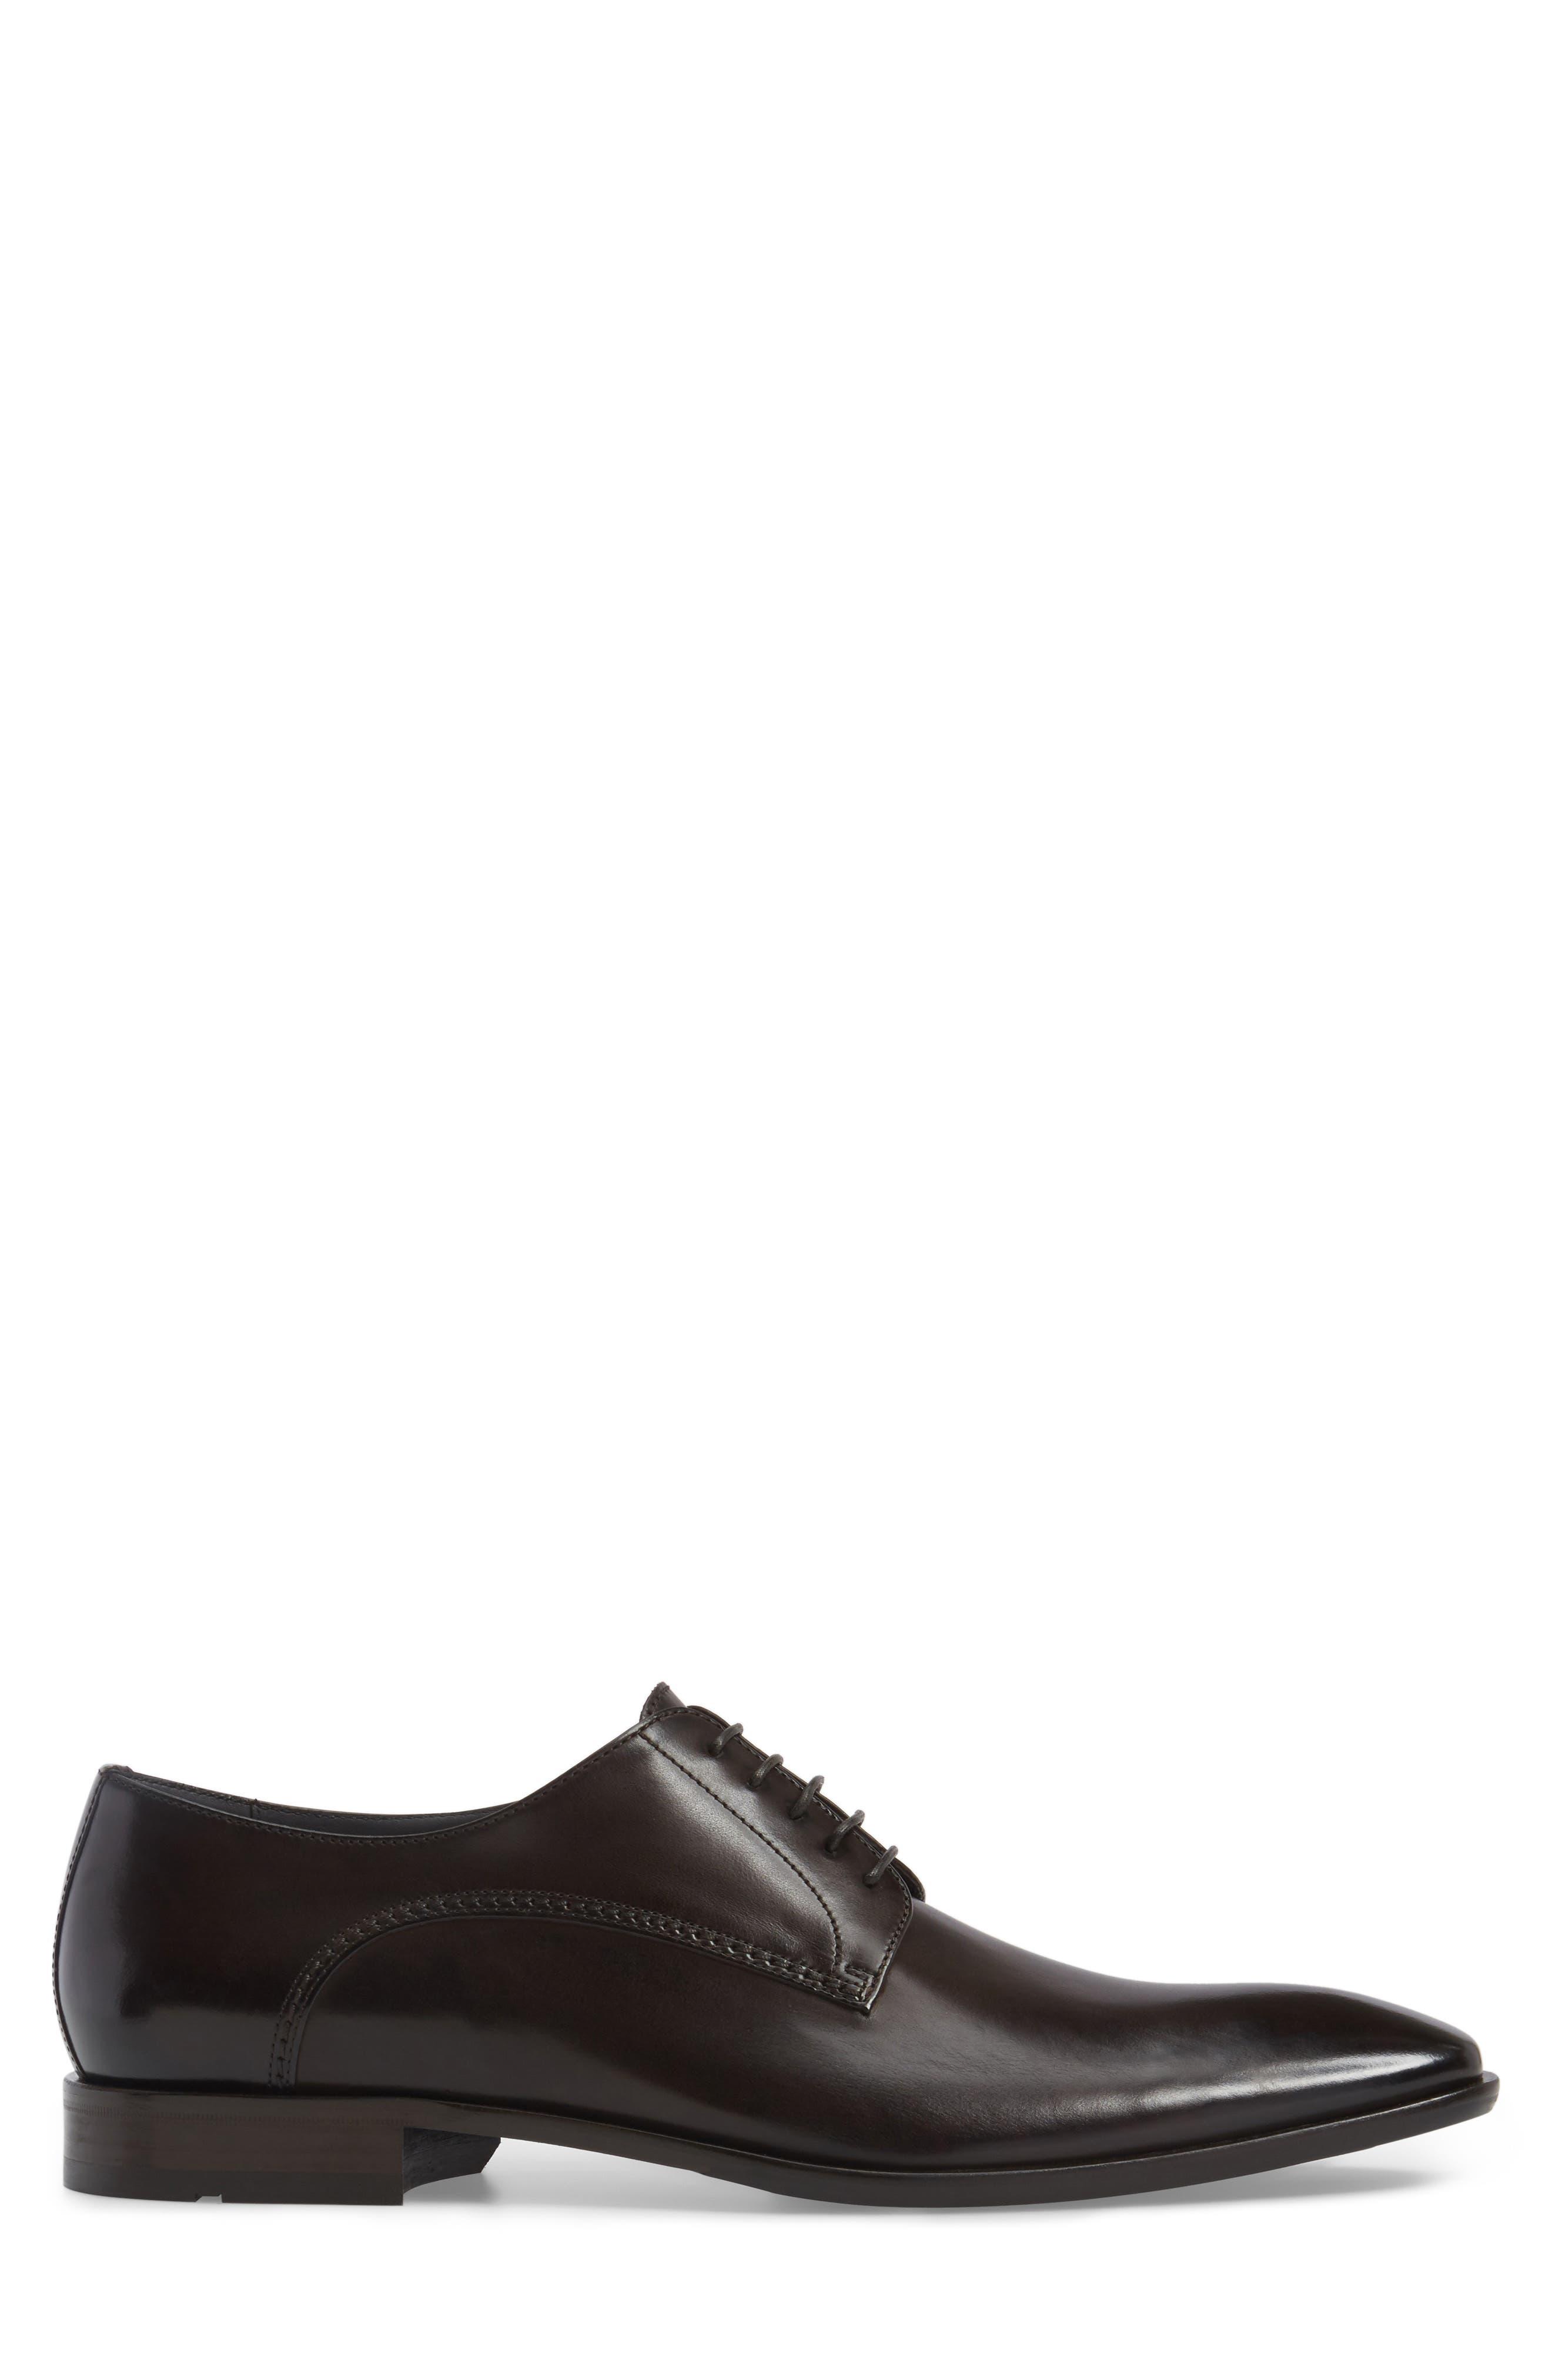 Carmons Plain Toe Derby,                             Alternate thumbnail 3, color,                             Dark Brown Leather